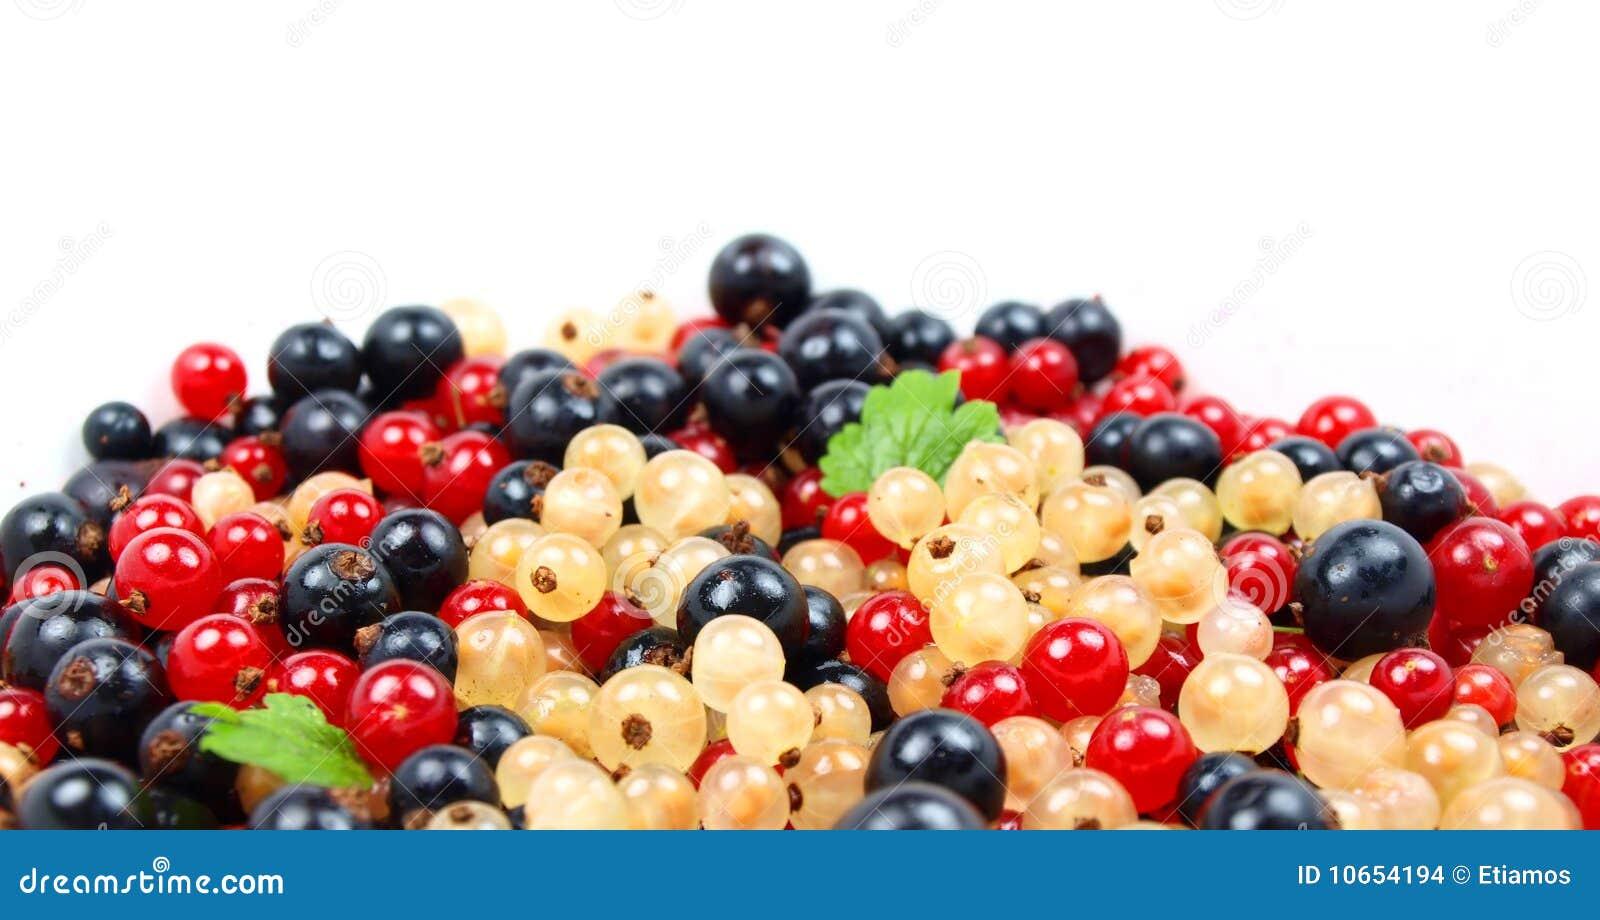 Beautiful fruit pictures - Beautiful Fruit